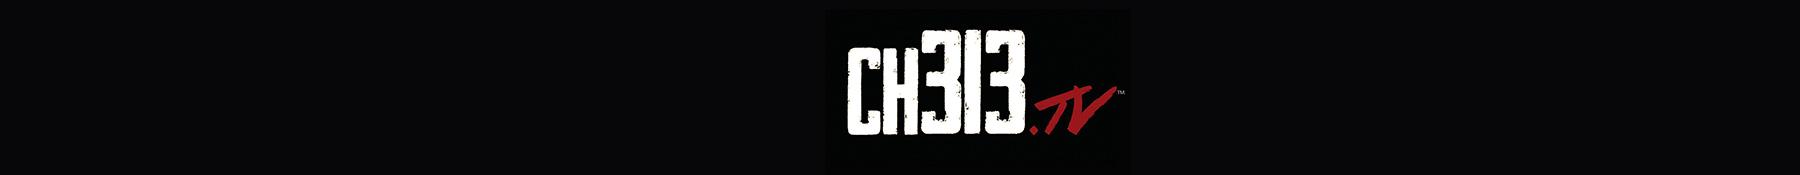 CH313.TV